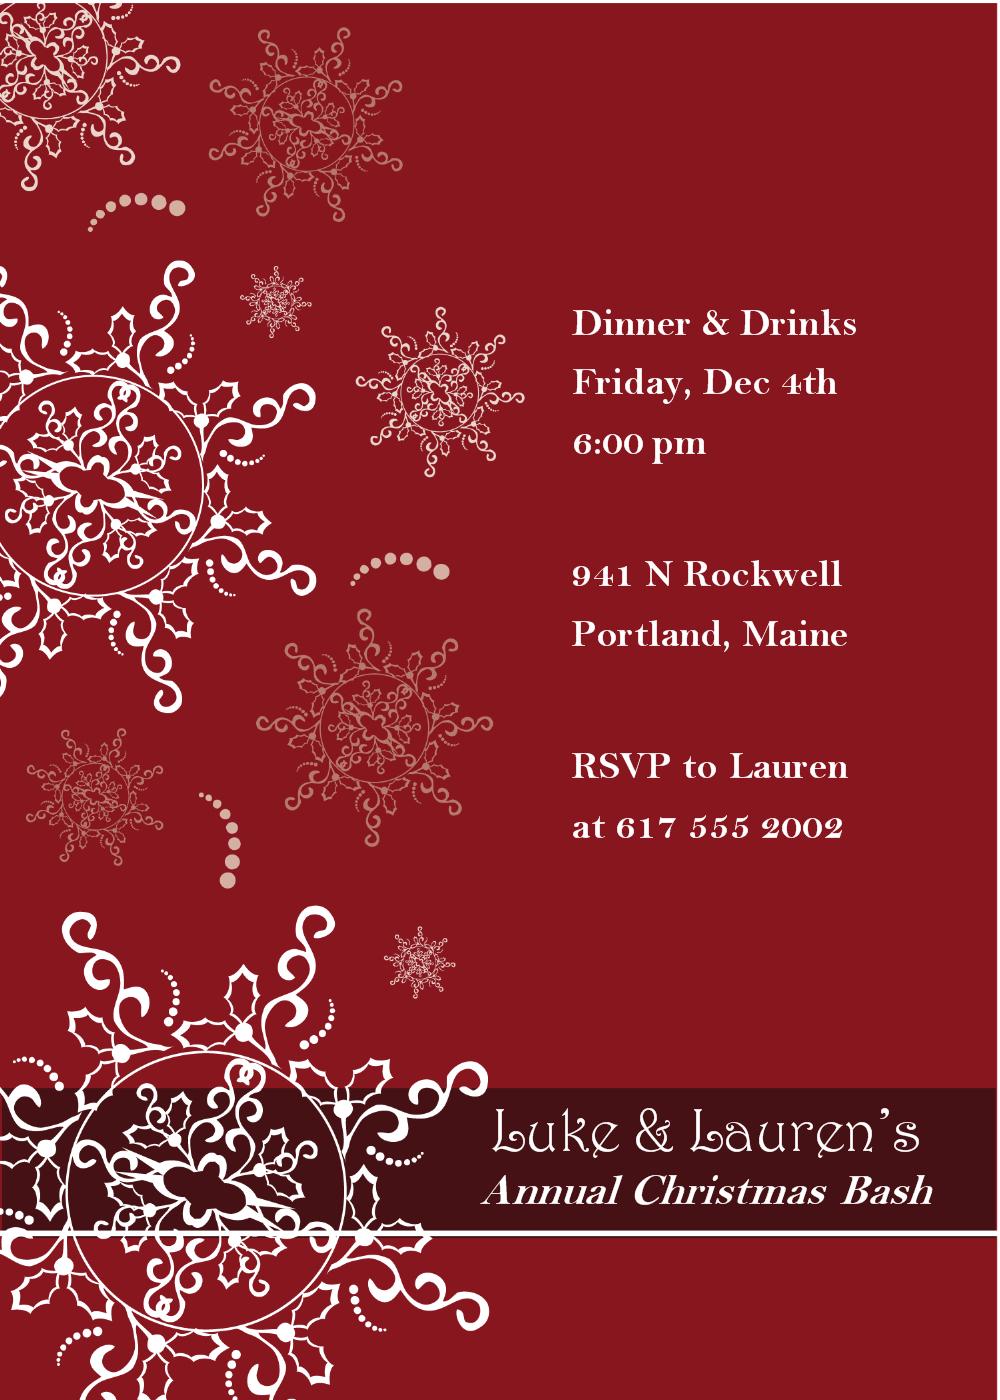 Christmas Party Invitation Templates - Bing Images | Christmas Card - Christmas Party Invitation Templates Free Printable